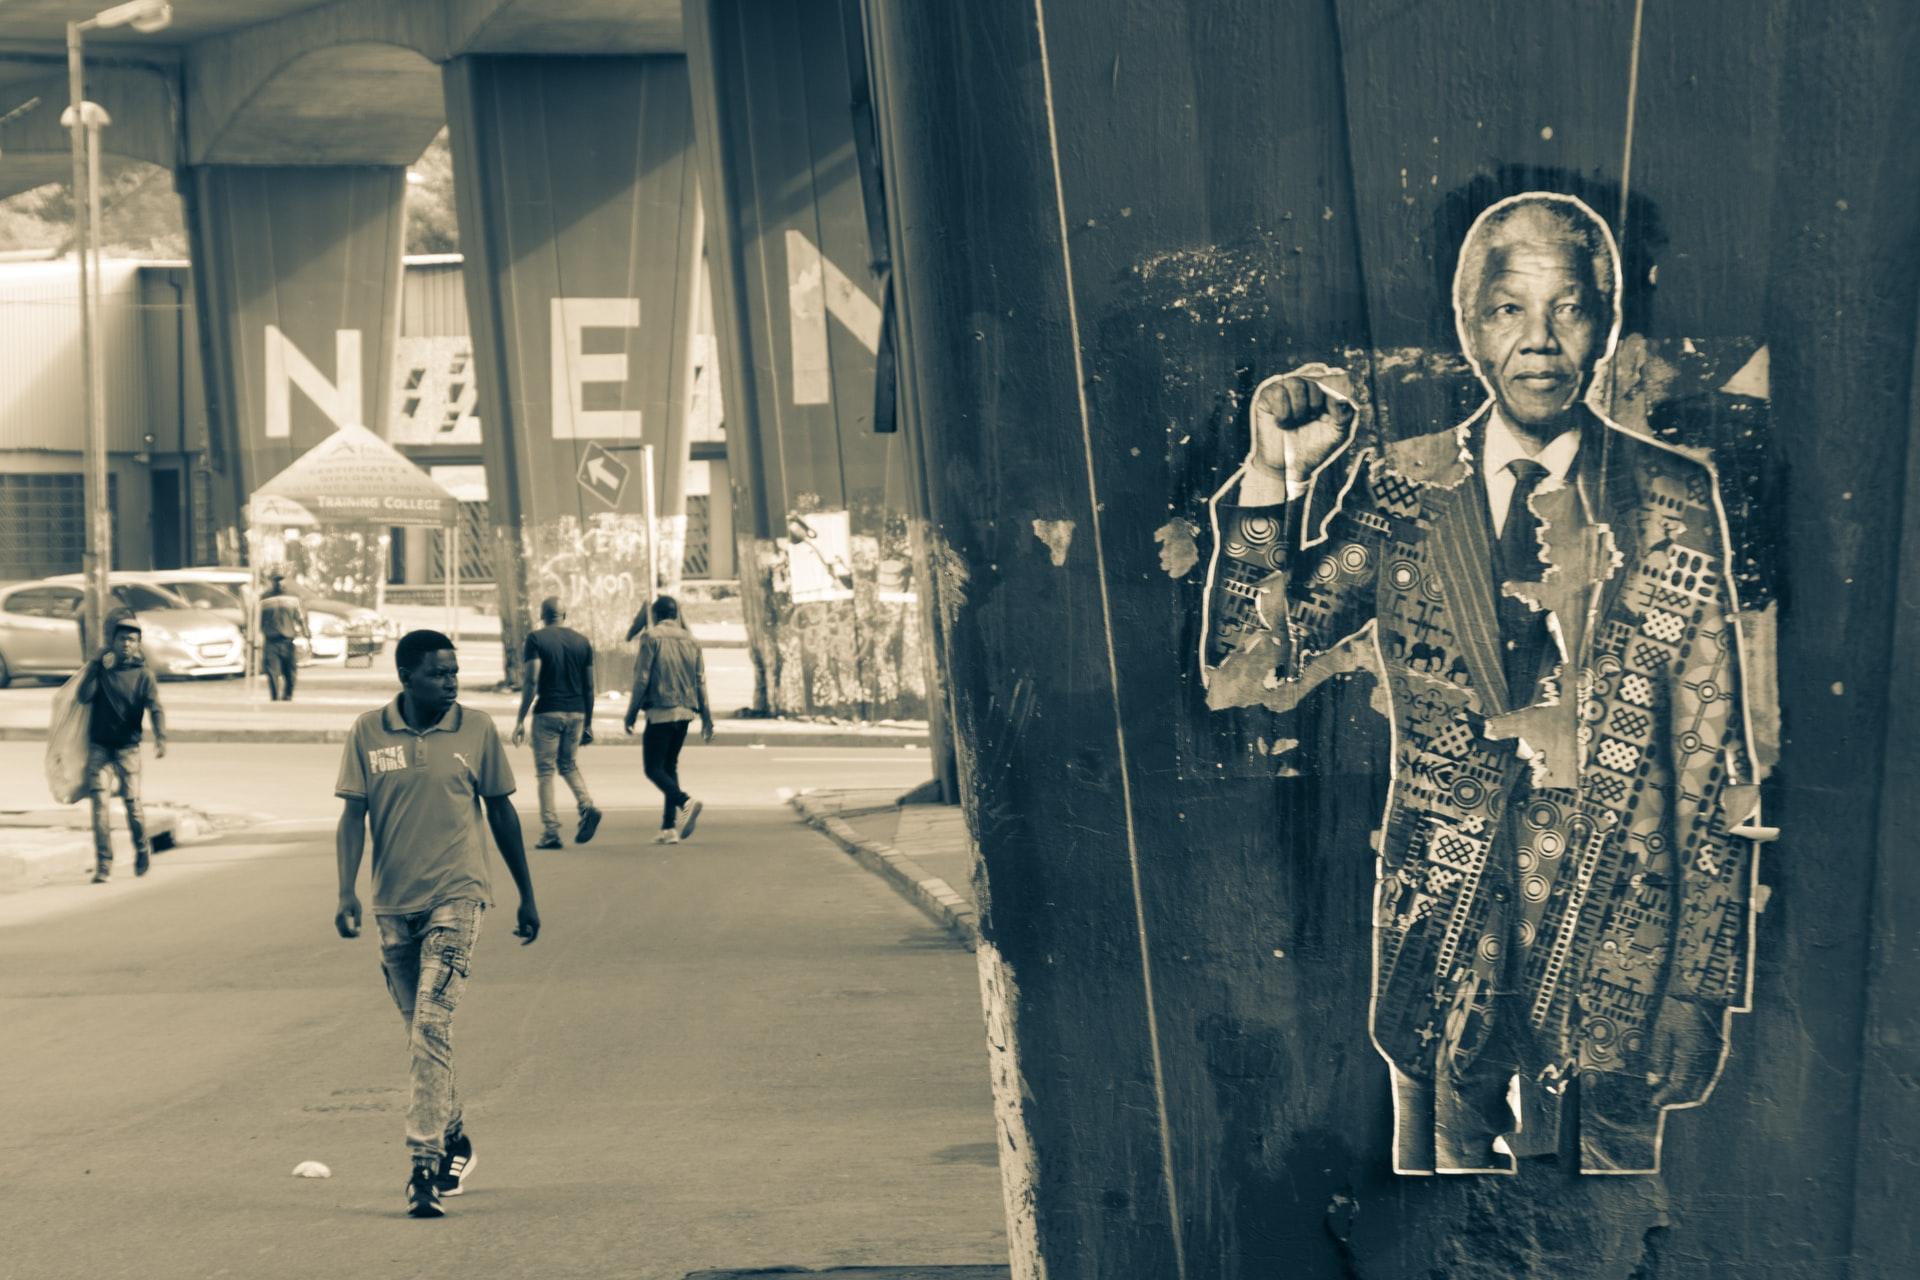 Leadership and culture change the Mandela way